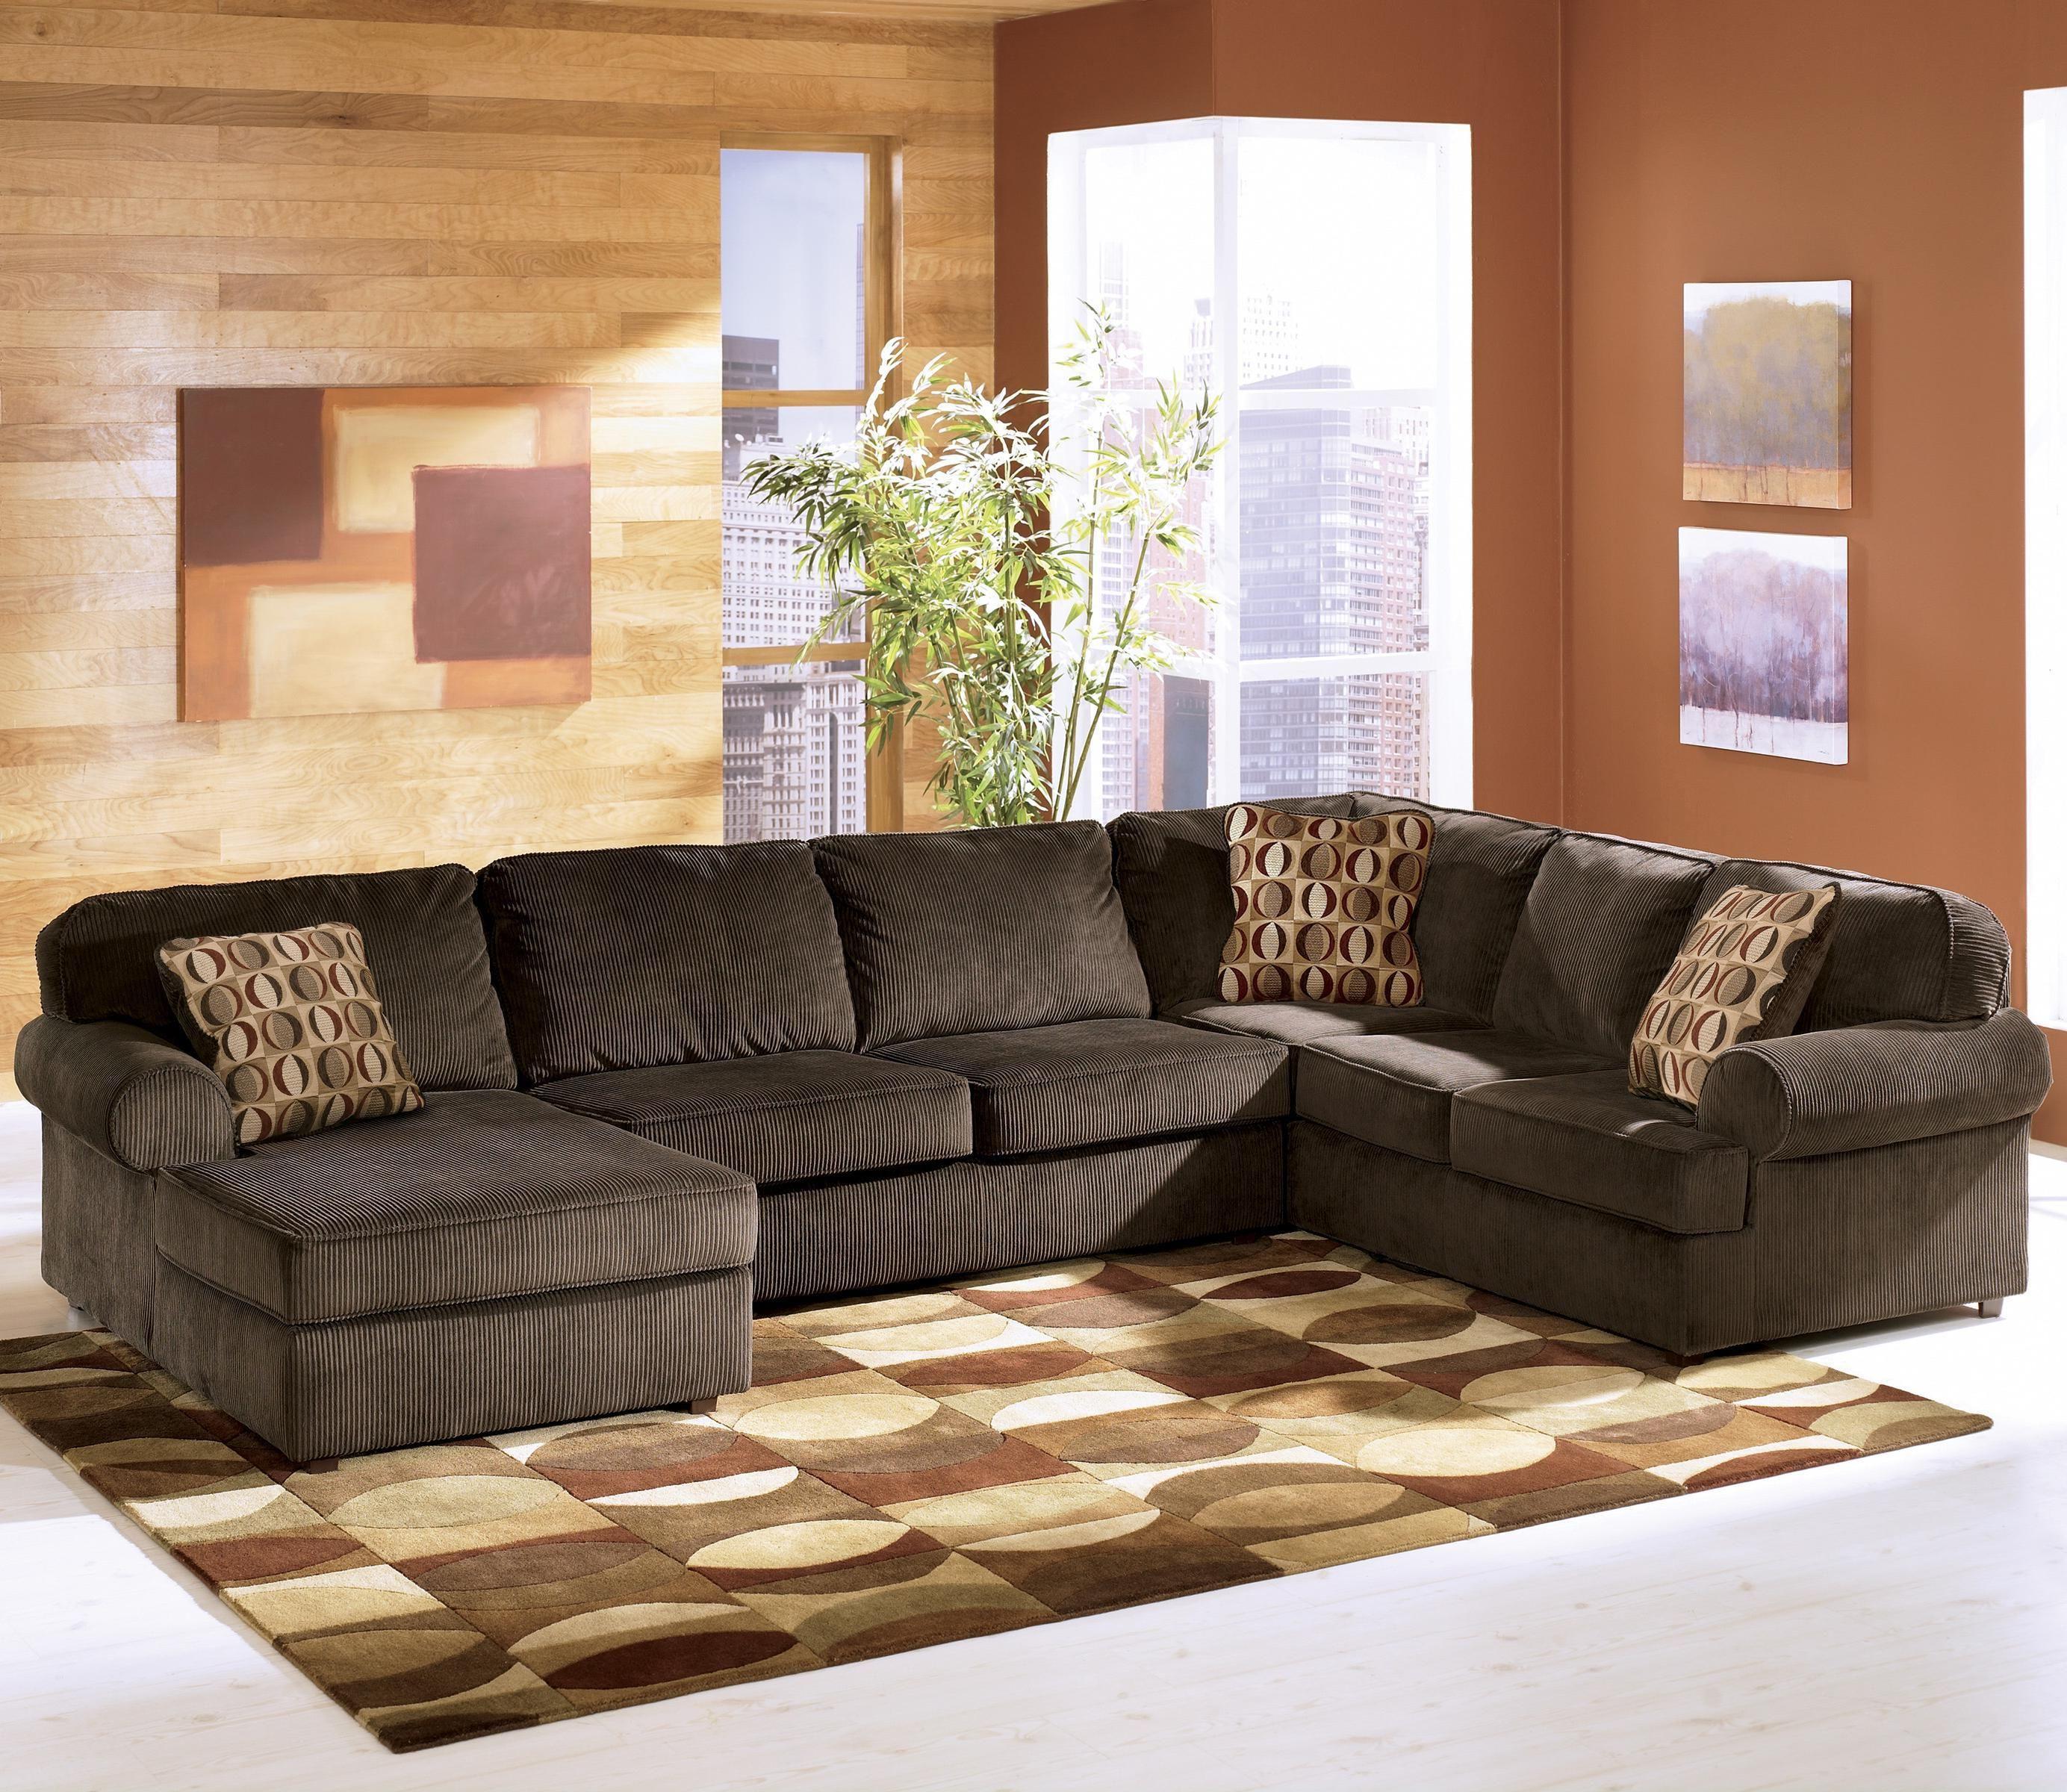 images about Furniture on Pinterest Pedestal table base